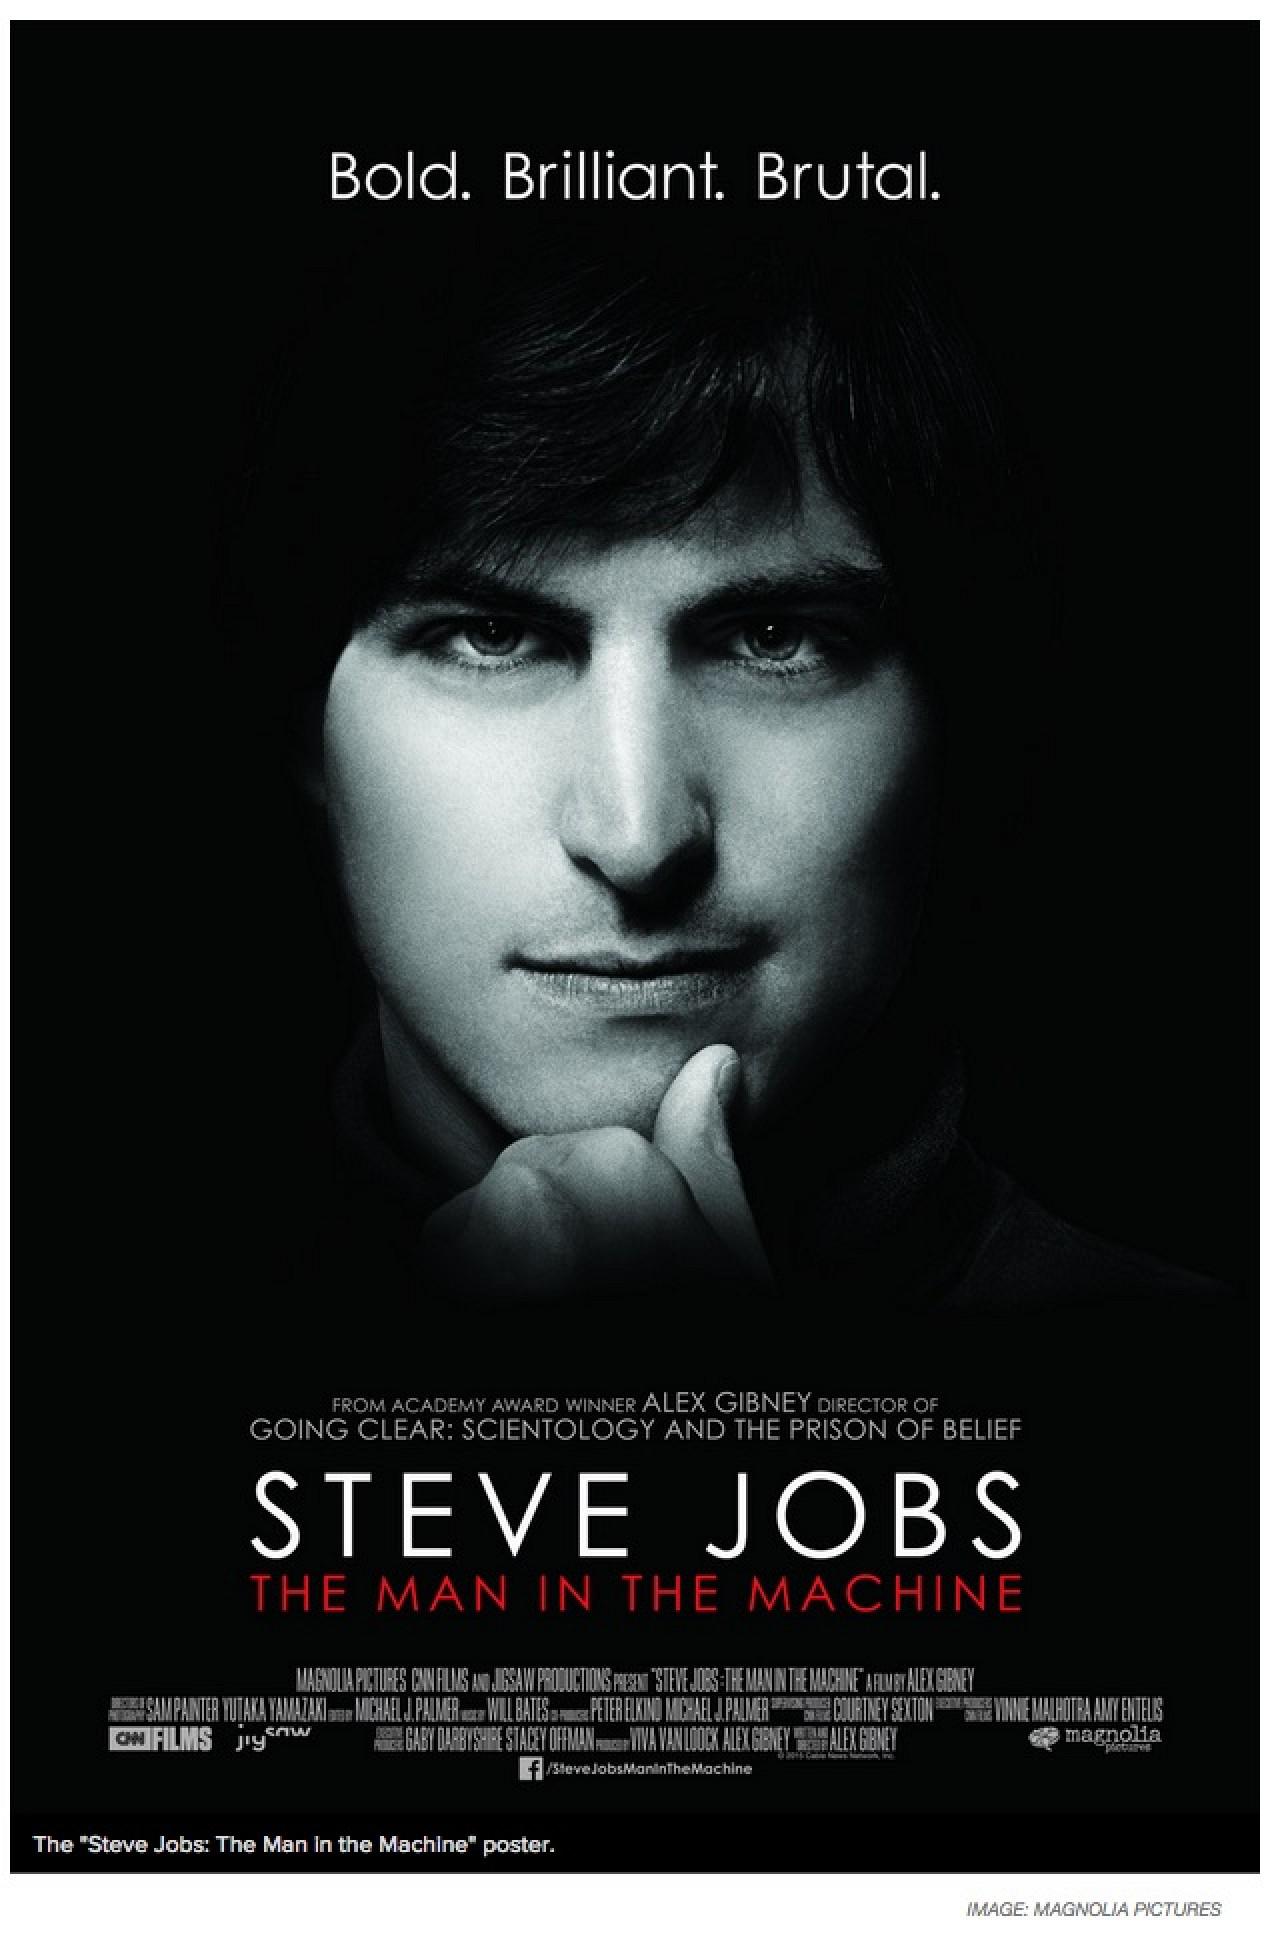 steve jobs poster First Trailer for 'Steve Jobs: The Man in the Machine' Documentary Released - Mac Rumors